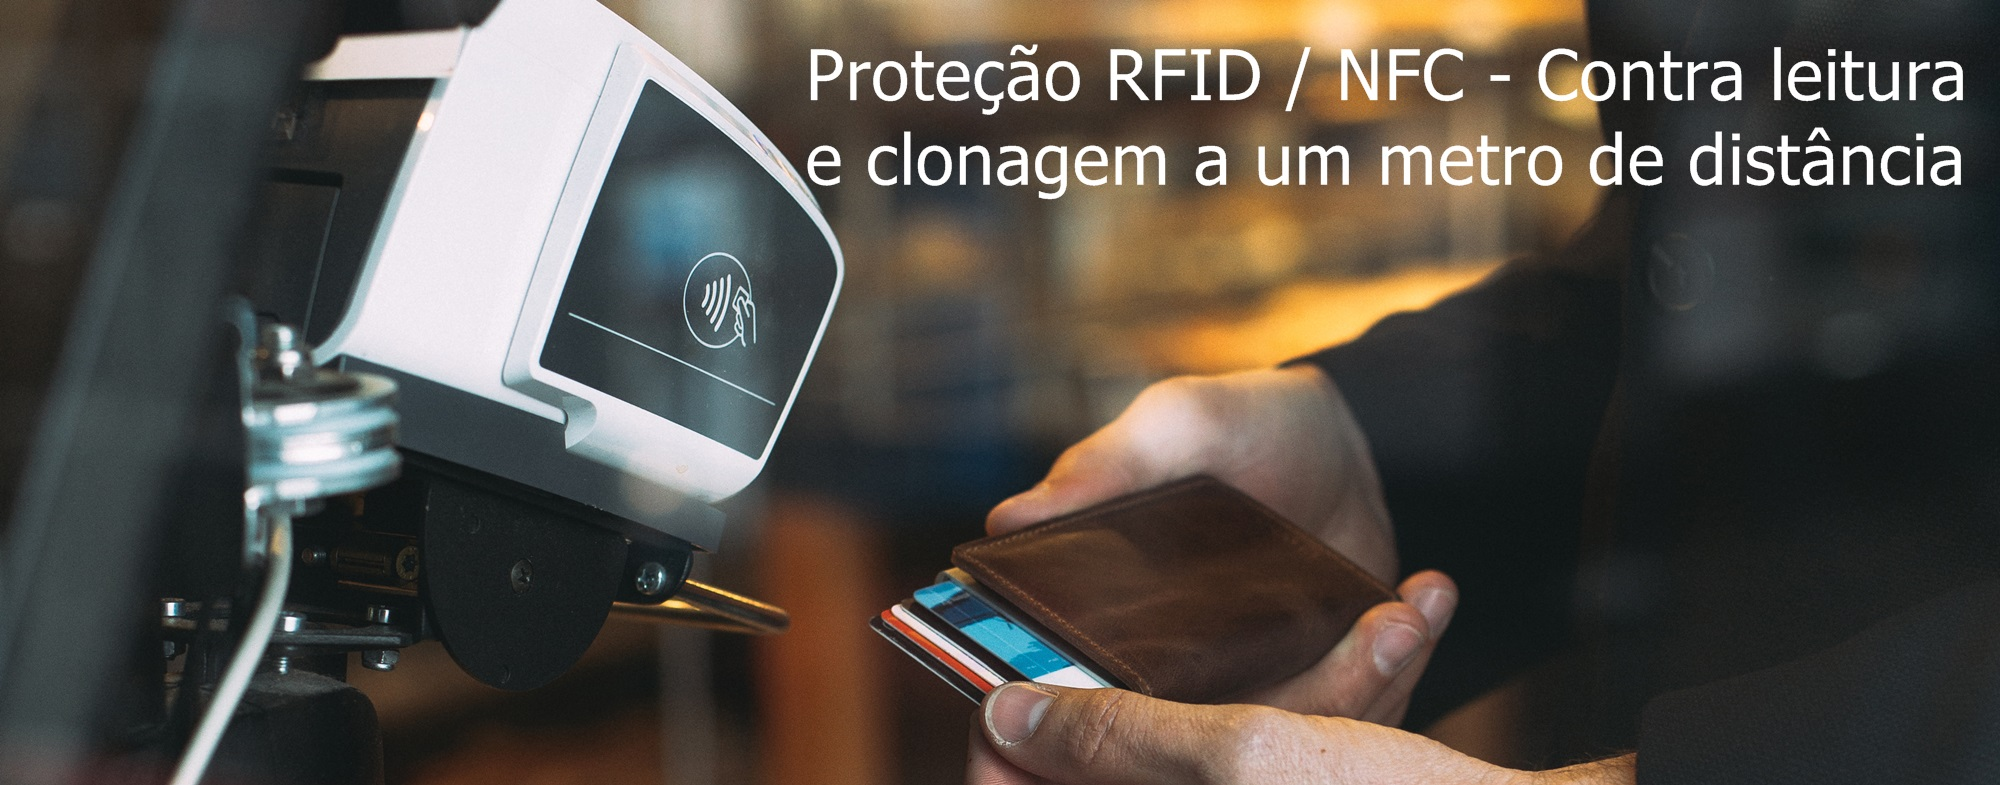 Secrid Online Portugal prtoteção RFID / NFC